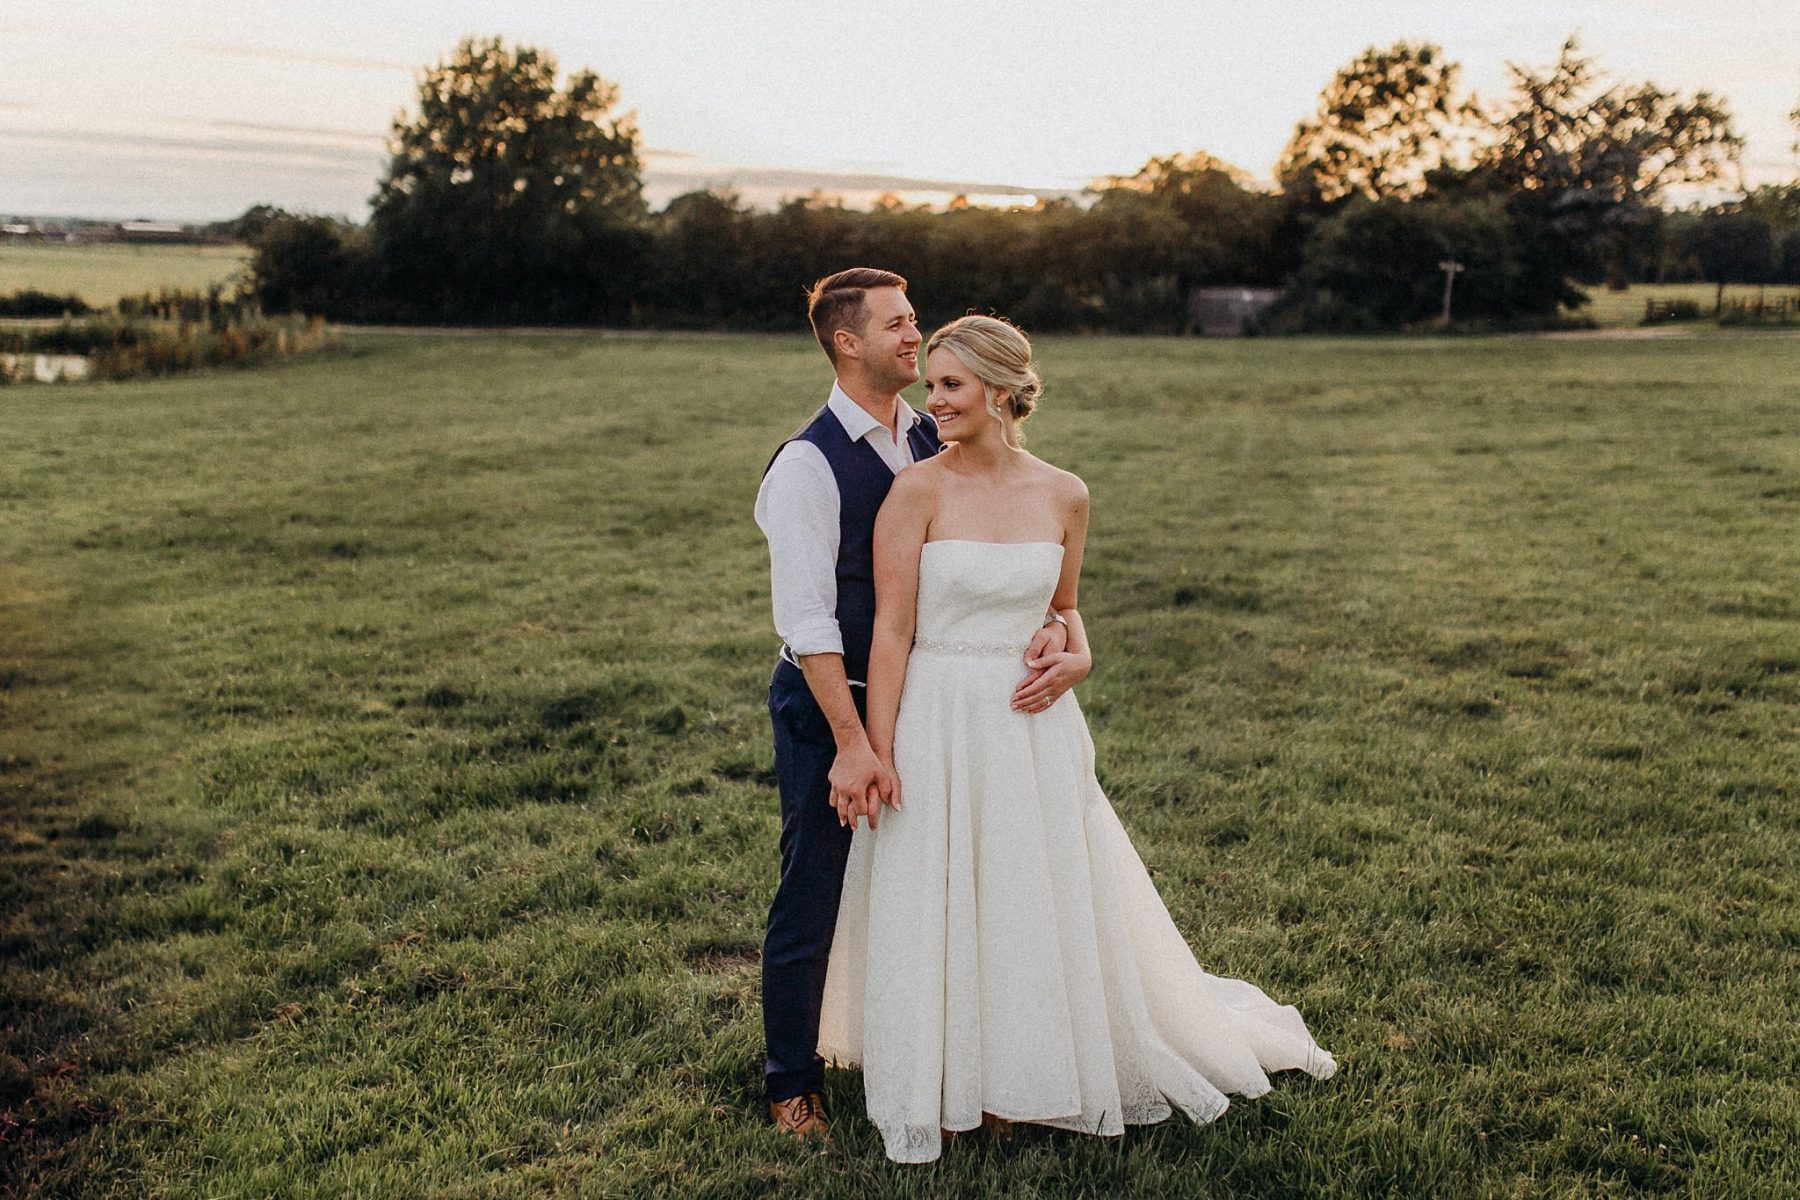 Pre Planning Your Wedding Photos